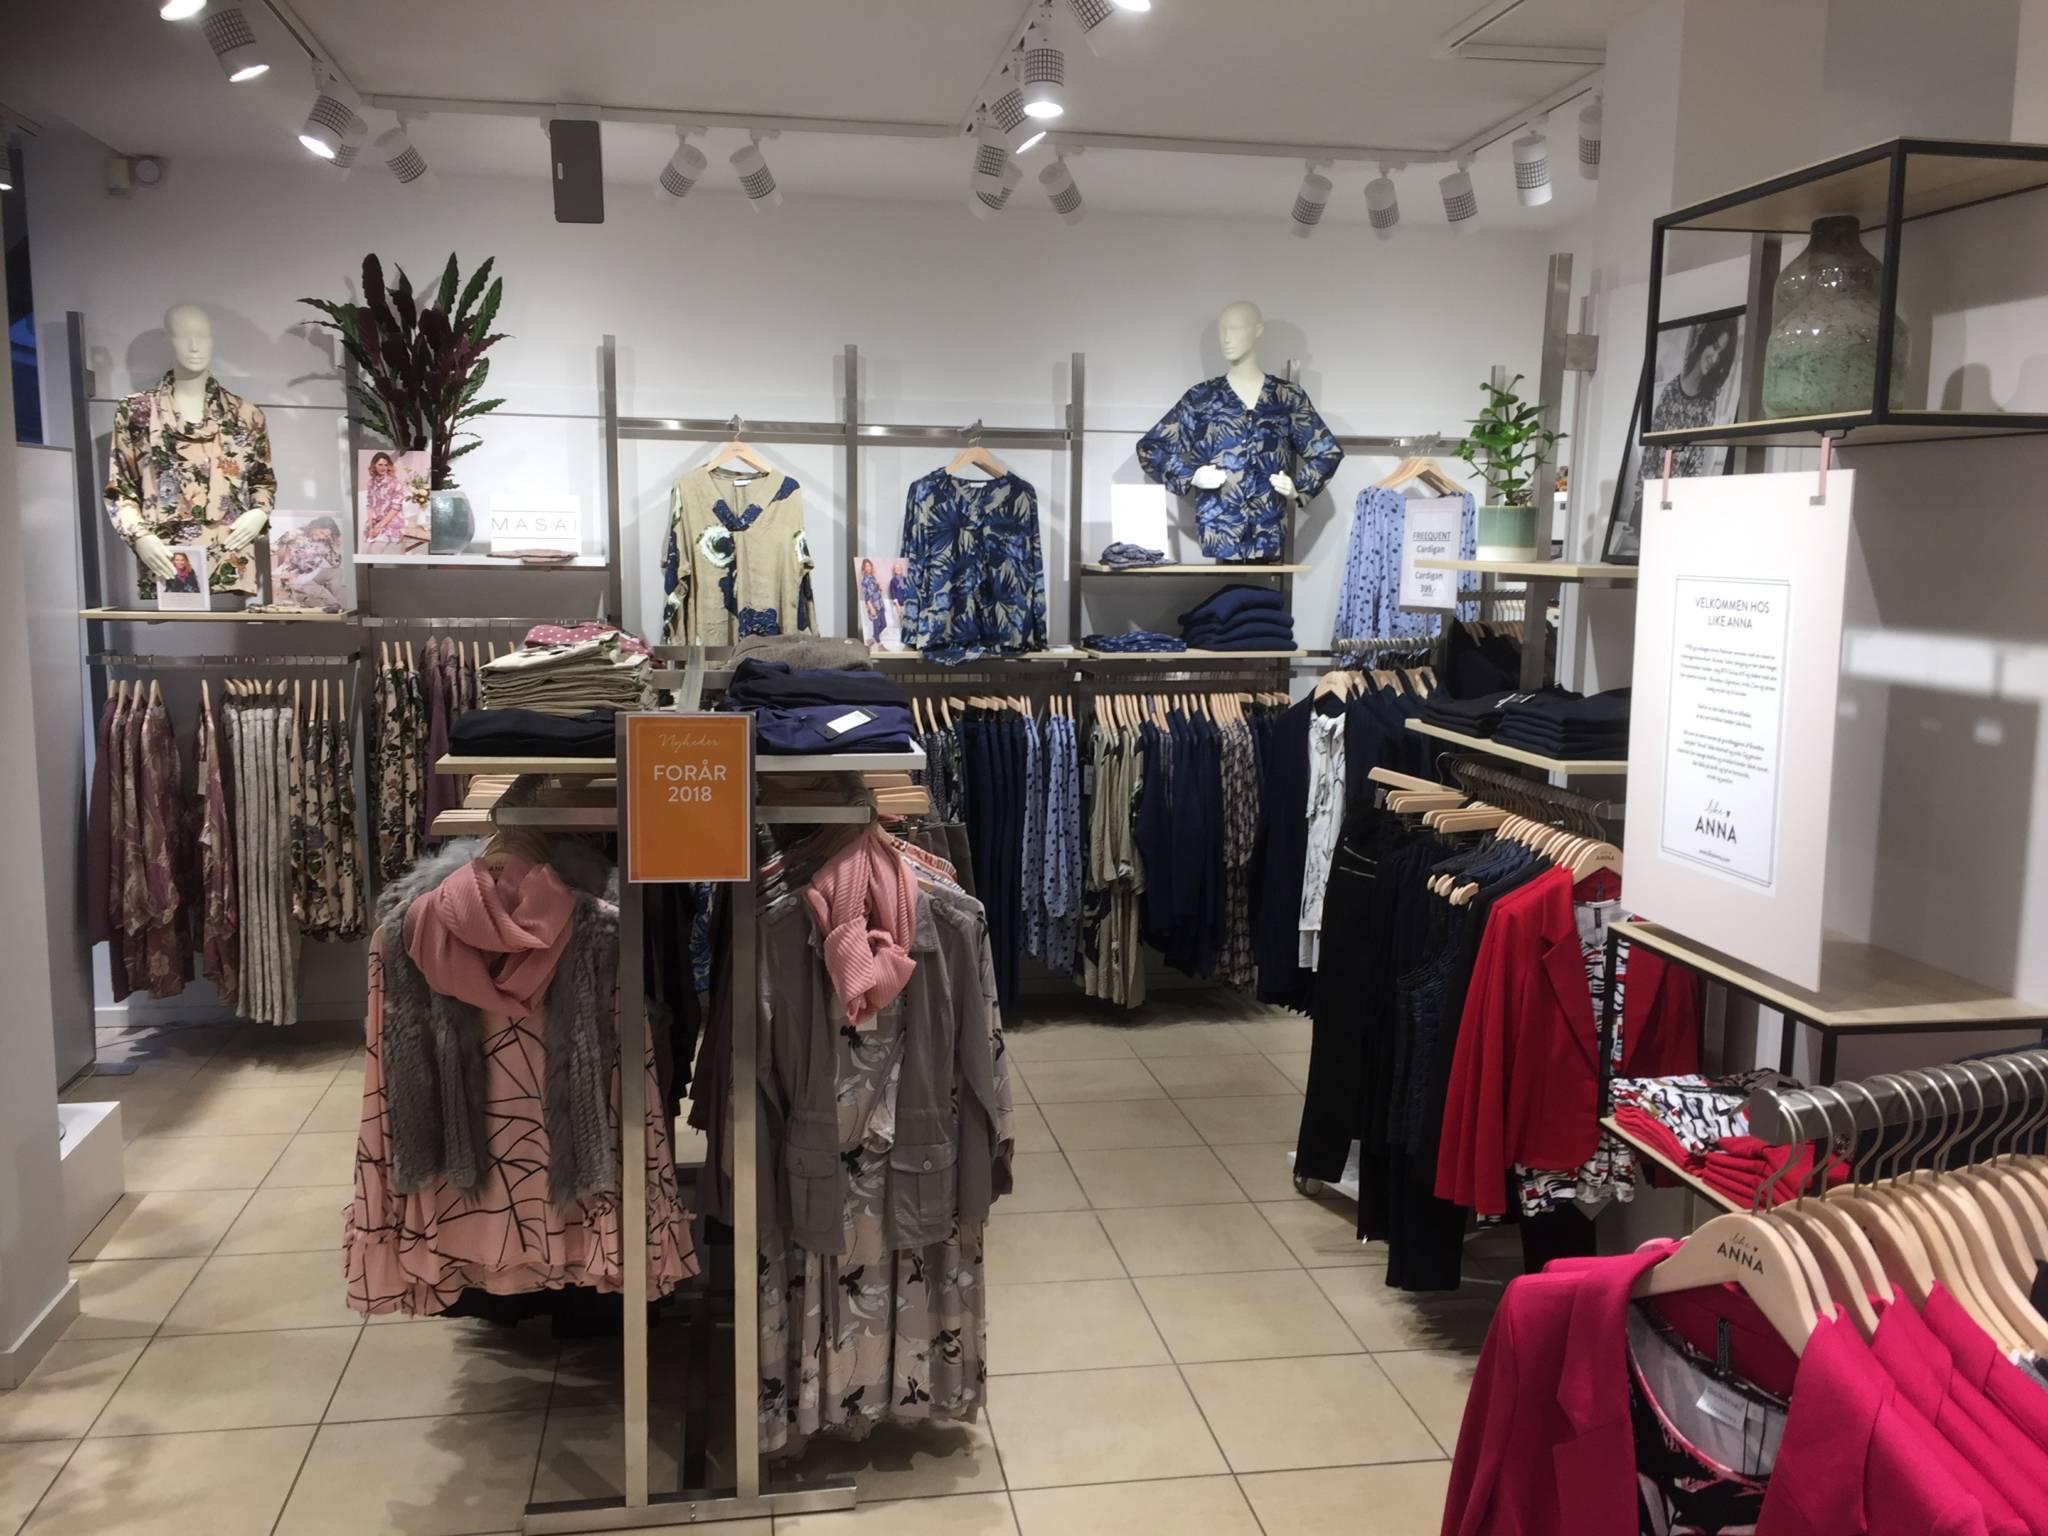 Flot indrettet modebutik med design mannequiner. Butiksinventar. Butiksindretning.